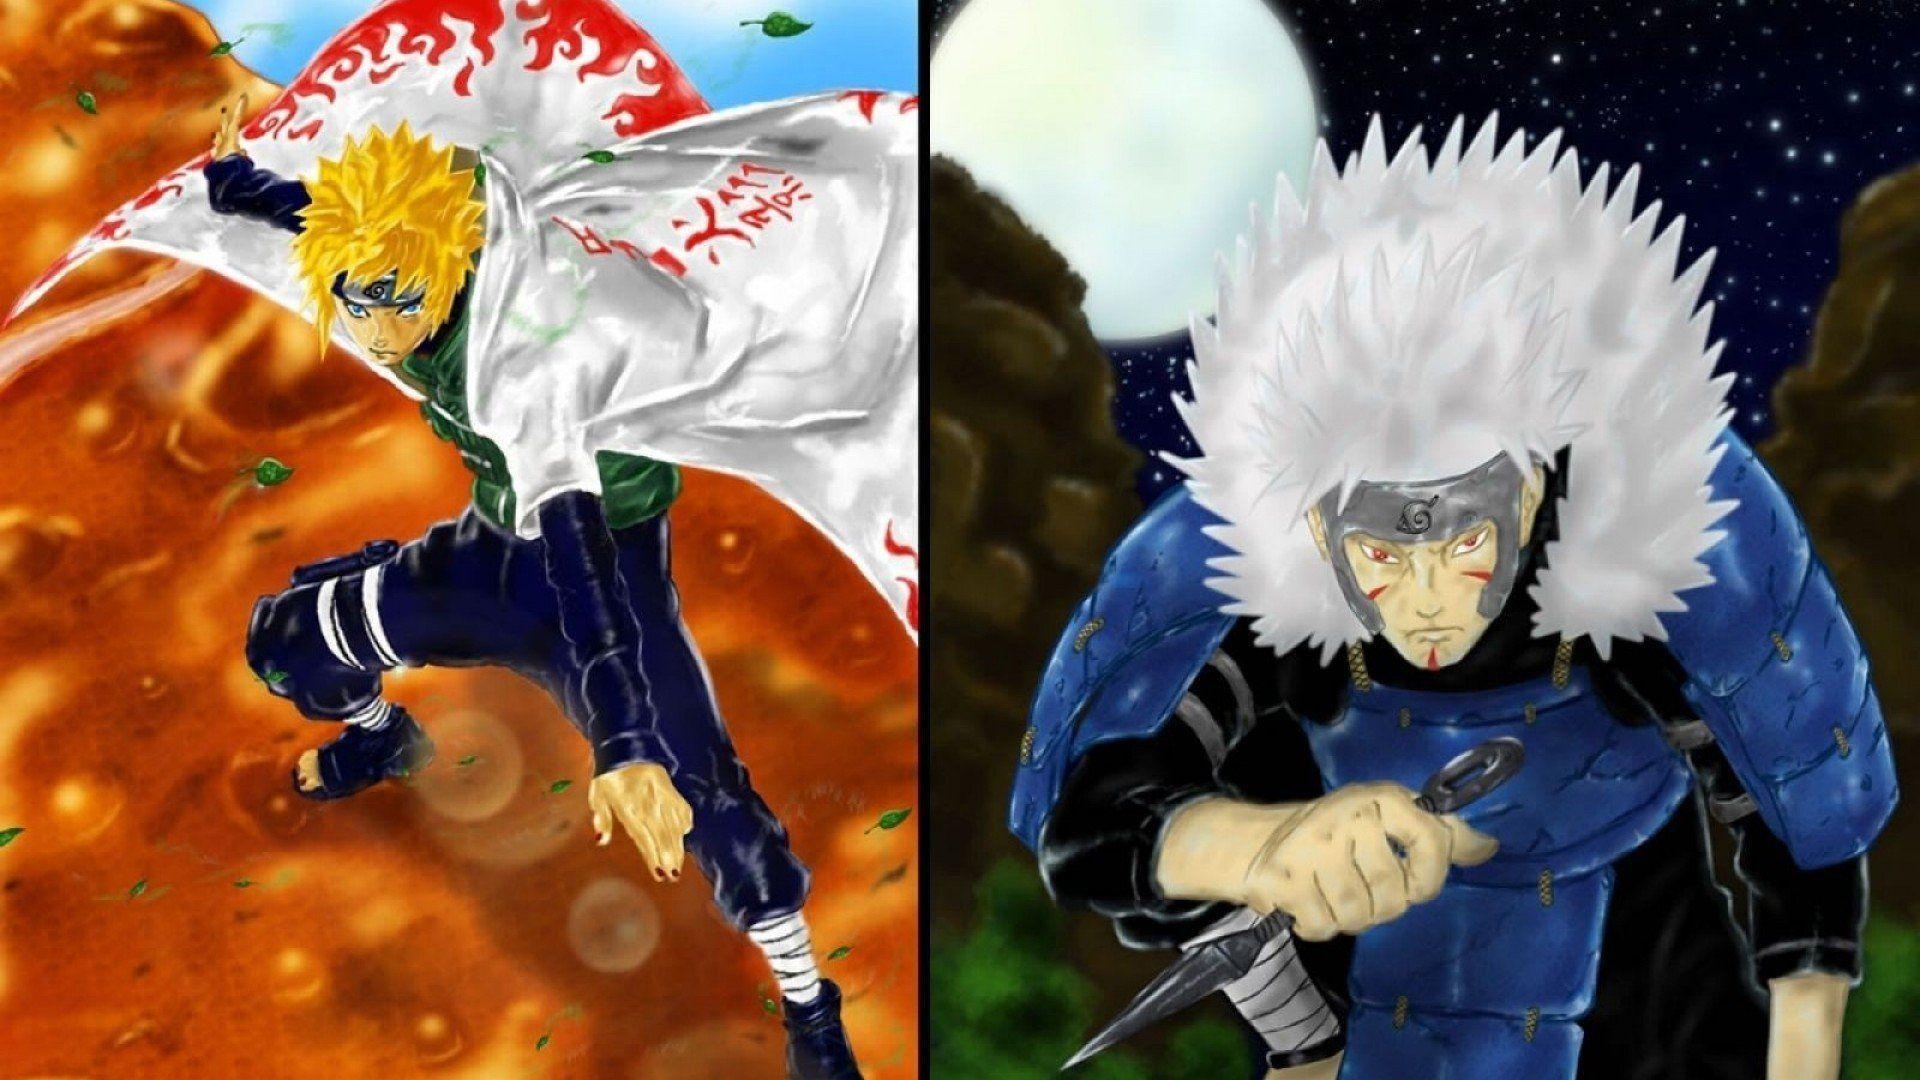 Naruto Shippuden Wallpaper Hd 1080p Namikaze Minato Wallpapers Wallpaper Cave